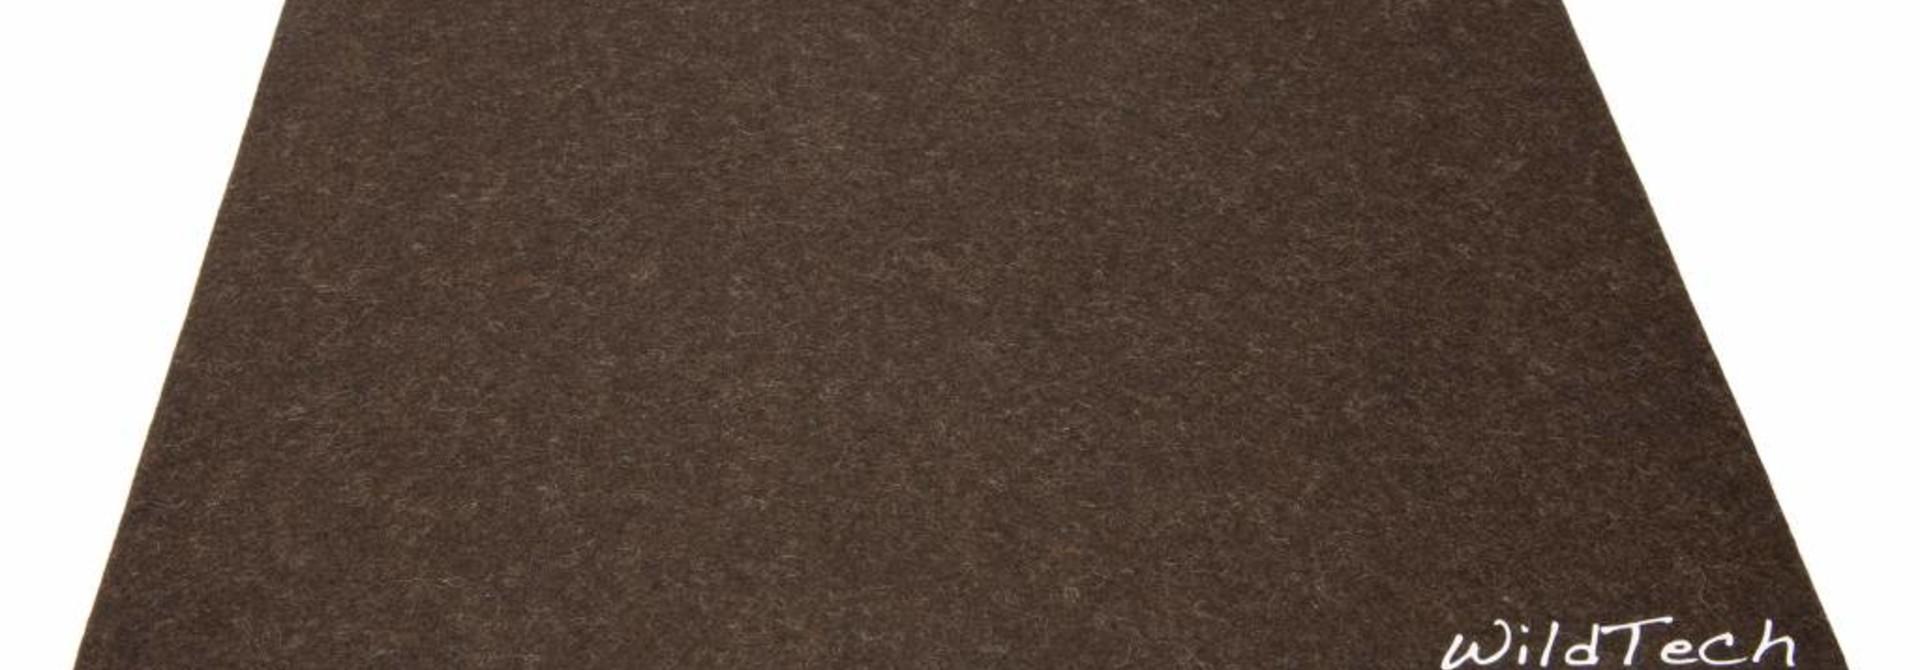 Push DeckCover Truffle-Brown